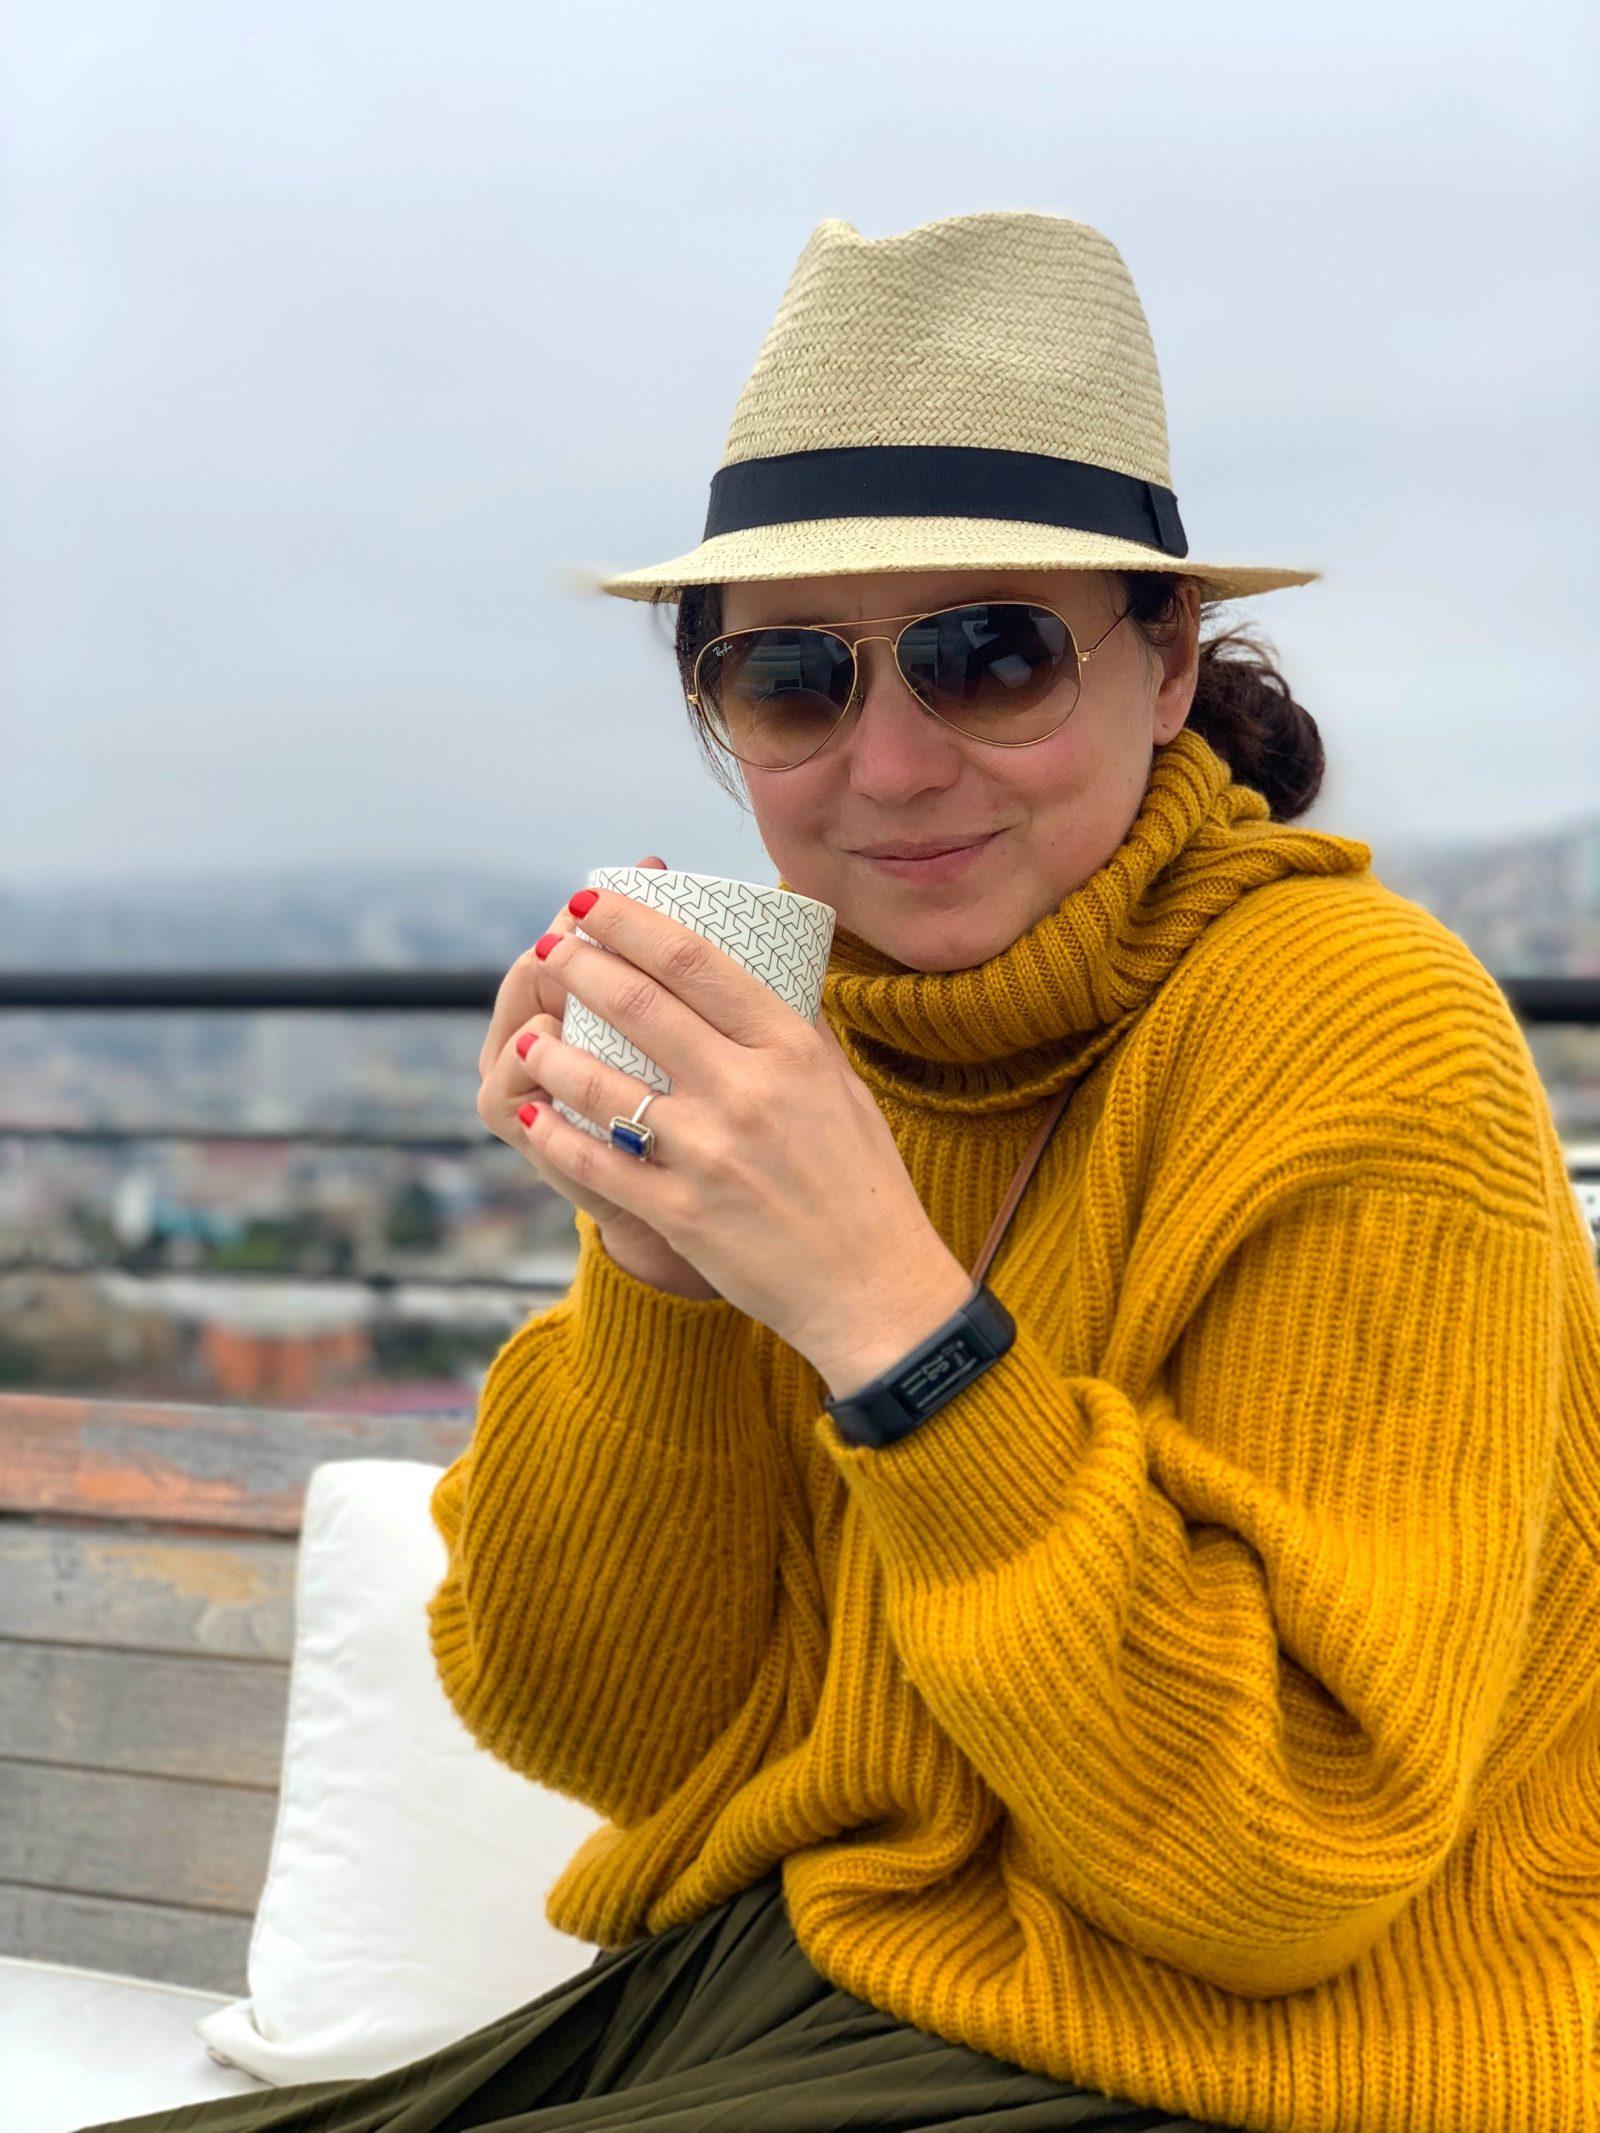 Casa Galos Valparaiso rooftop 2018 Round-up - StefanieGrace.com